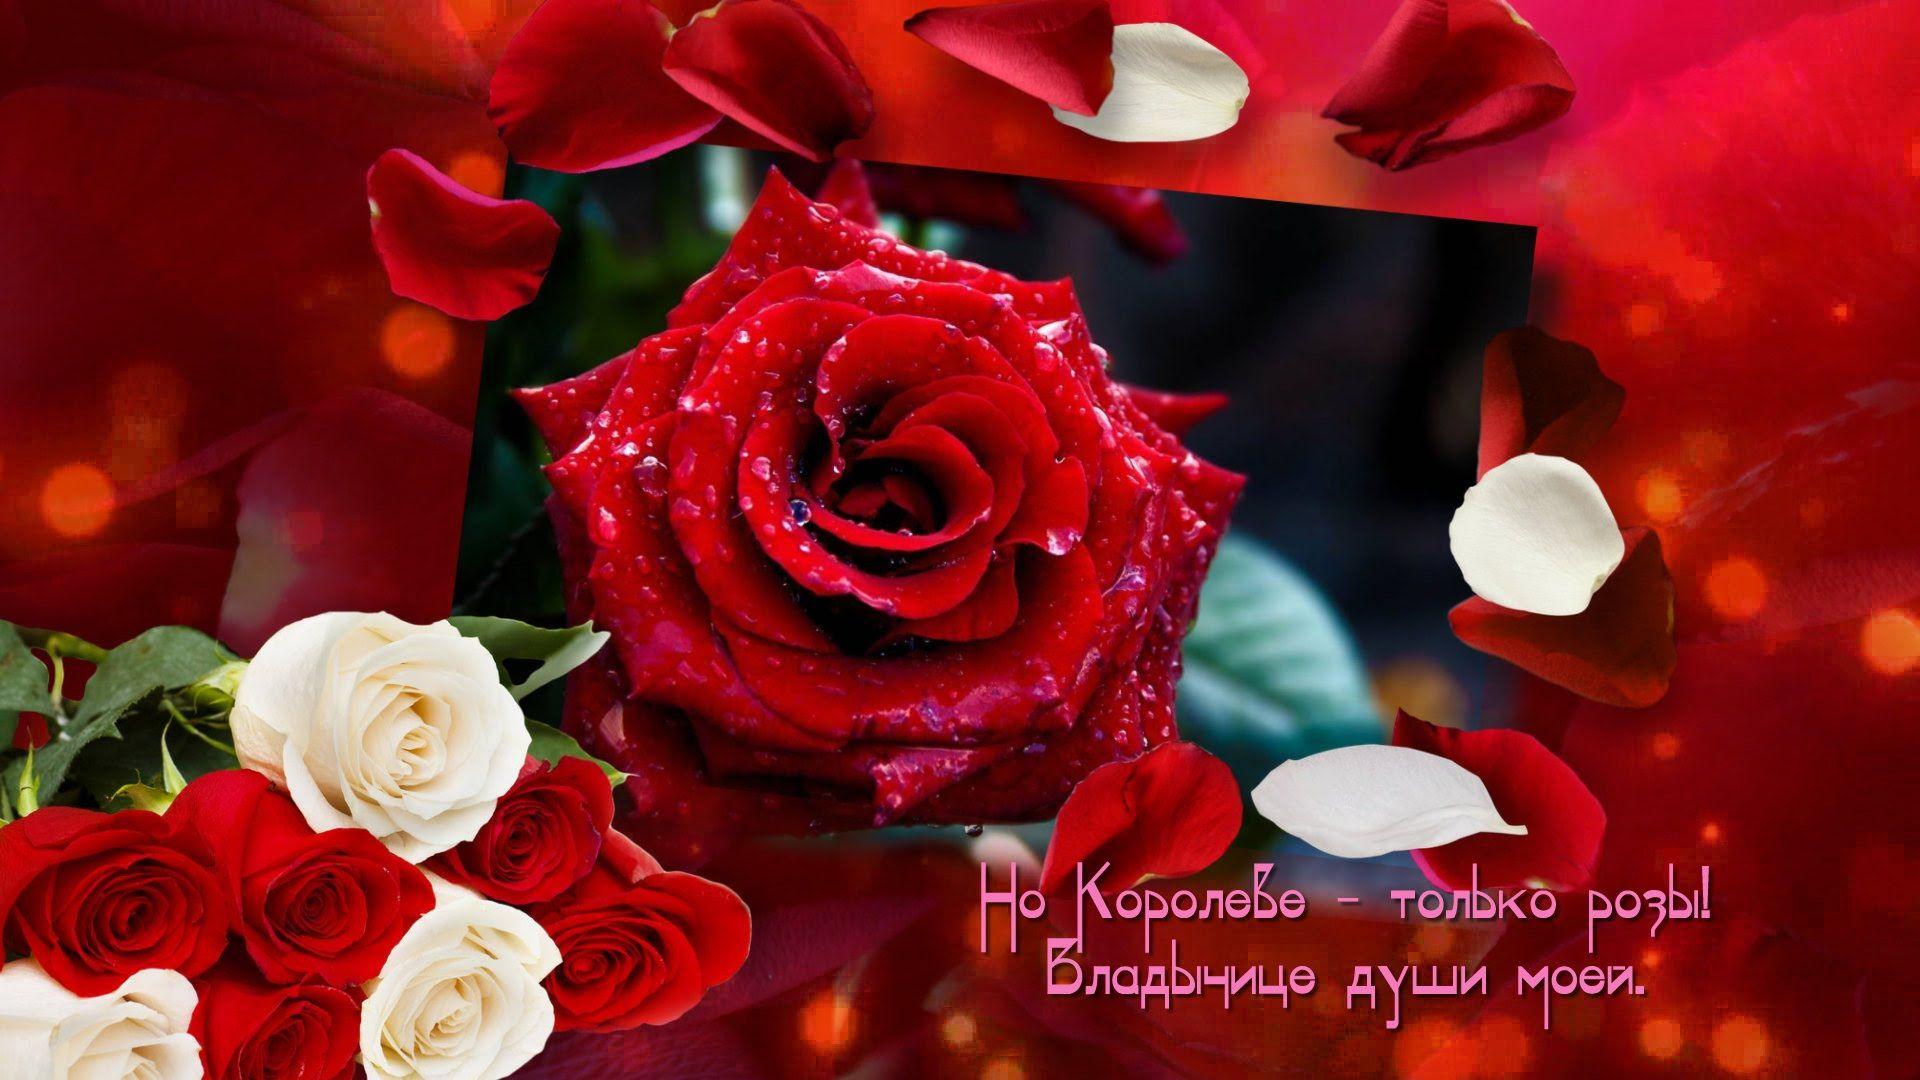 поздравление королева цветов знає кожна